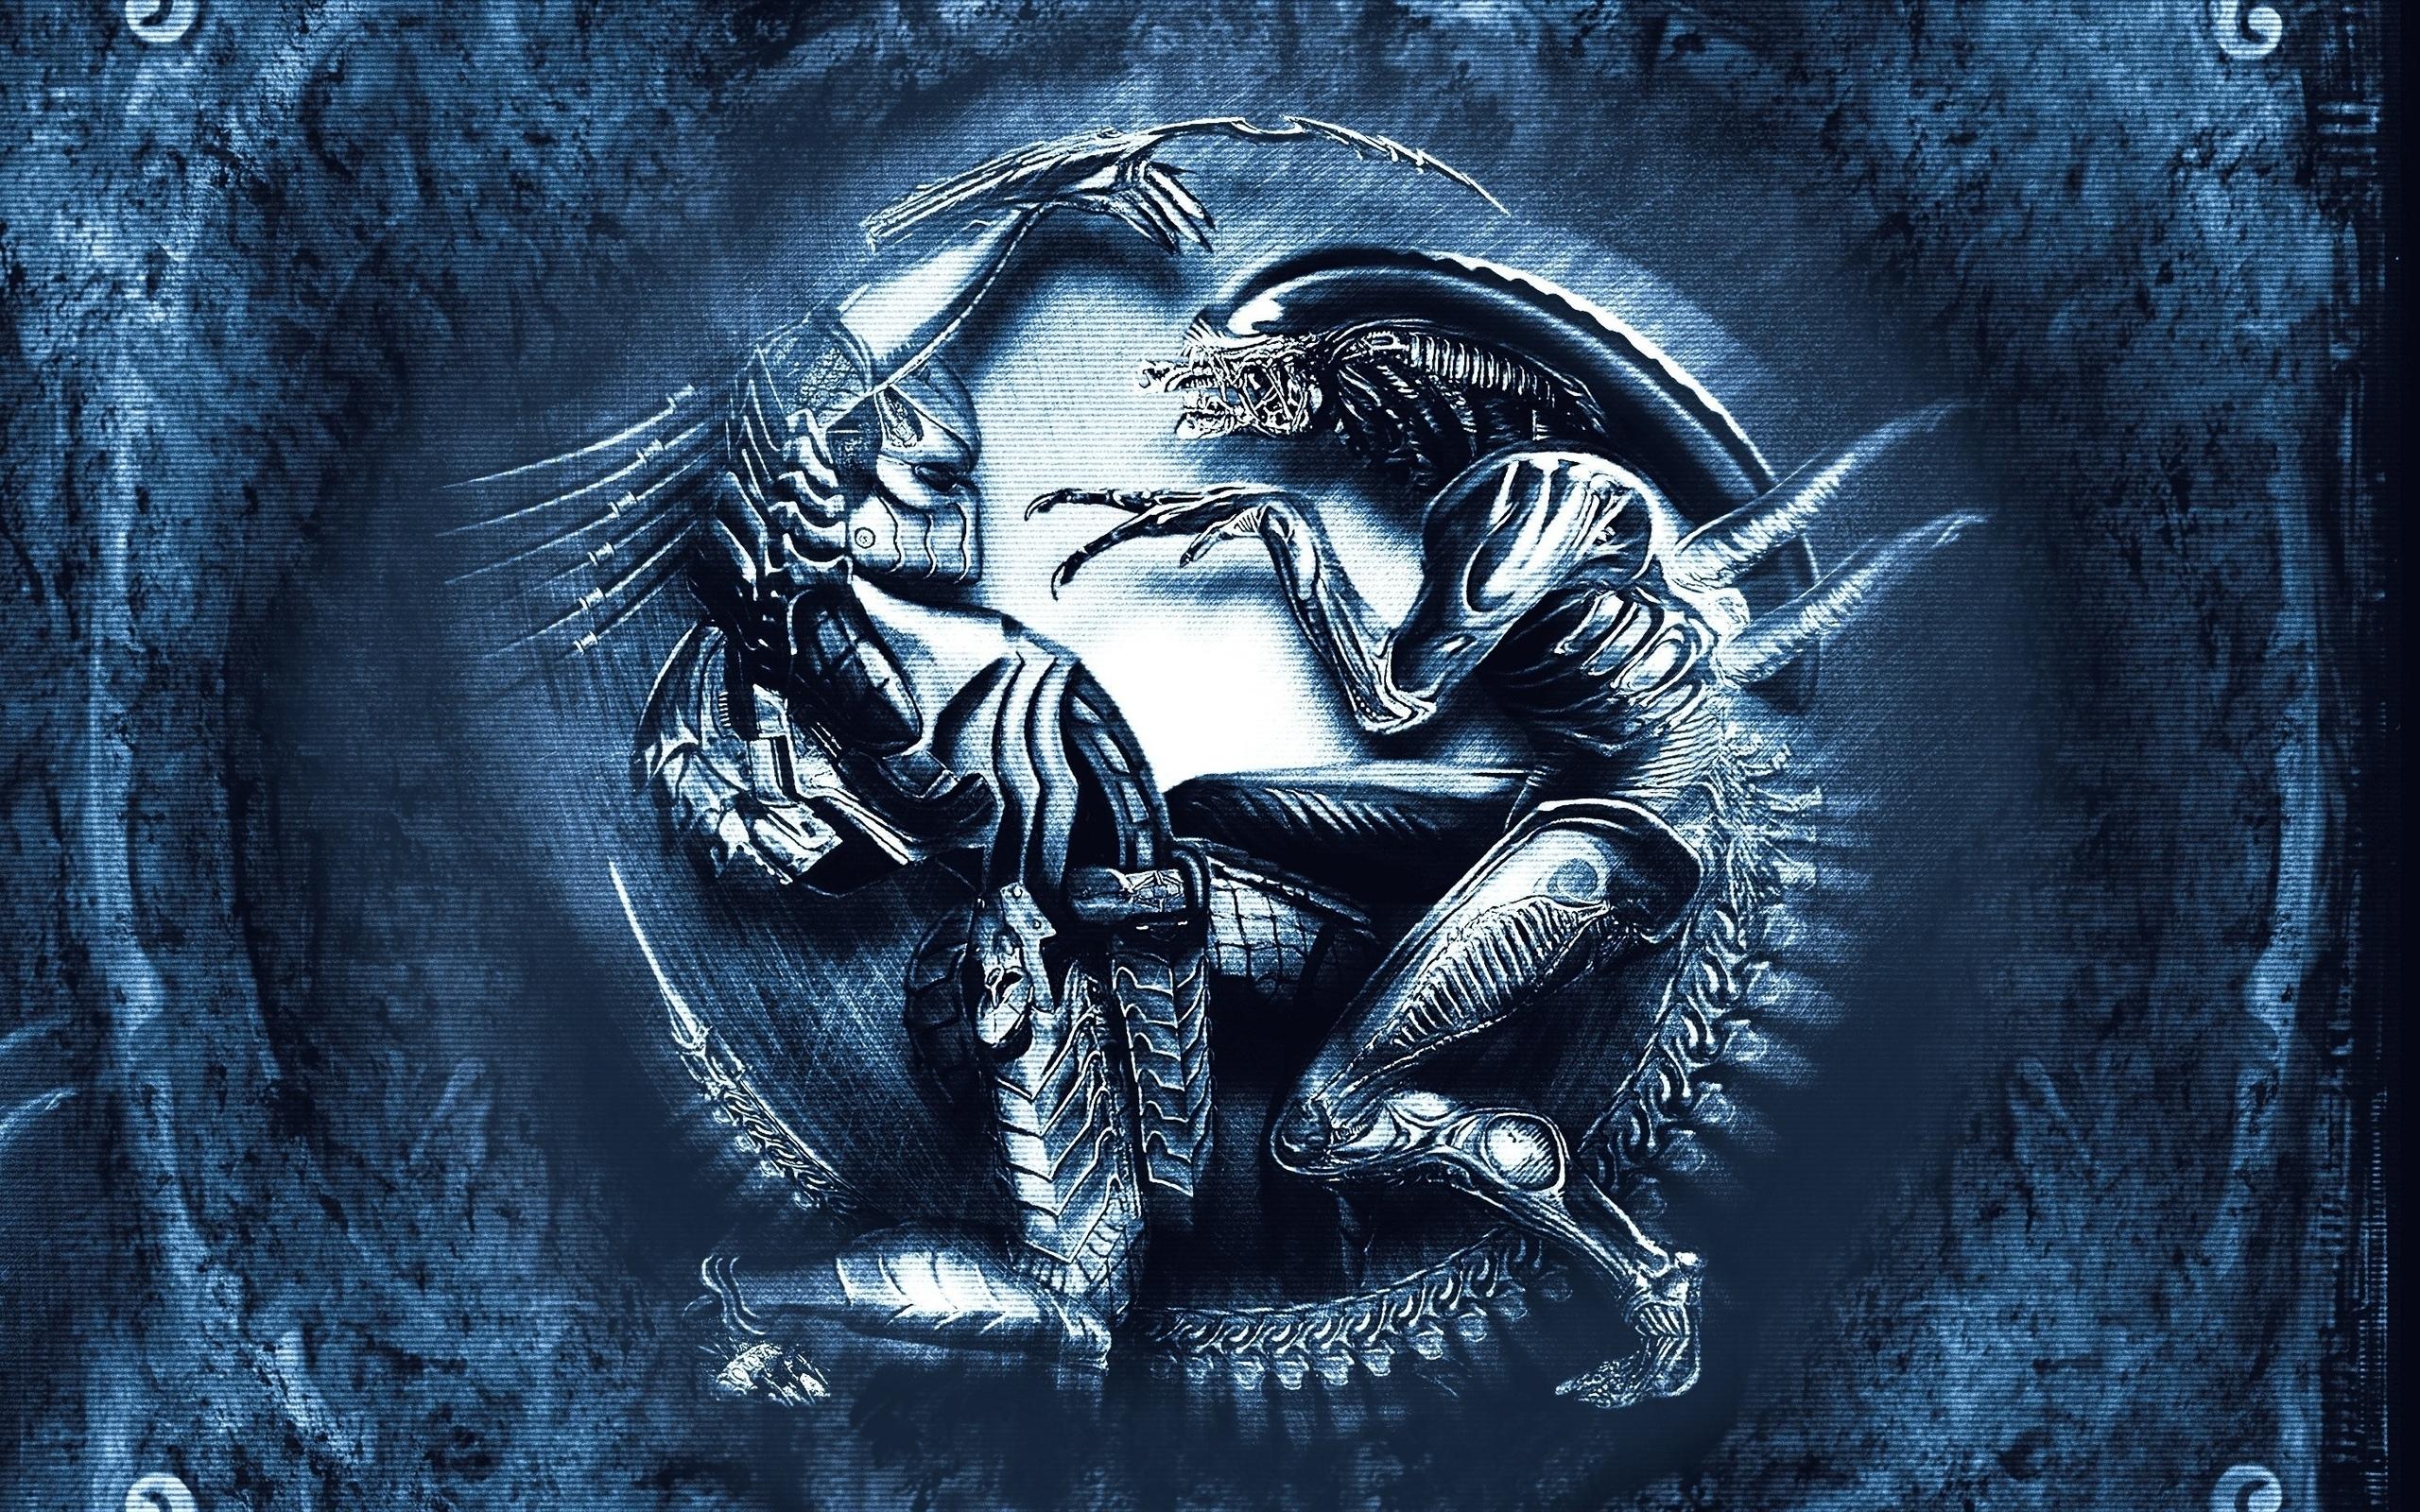 alien vs. predator full hd fond d'écran and arrière-plan   2560x1600